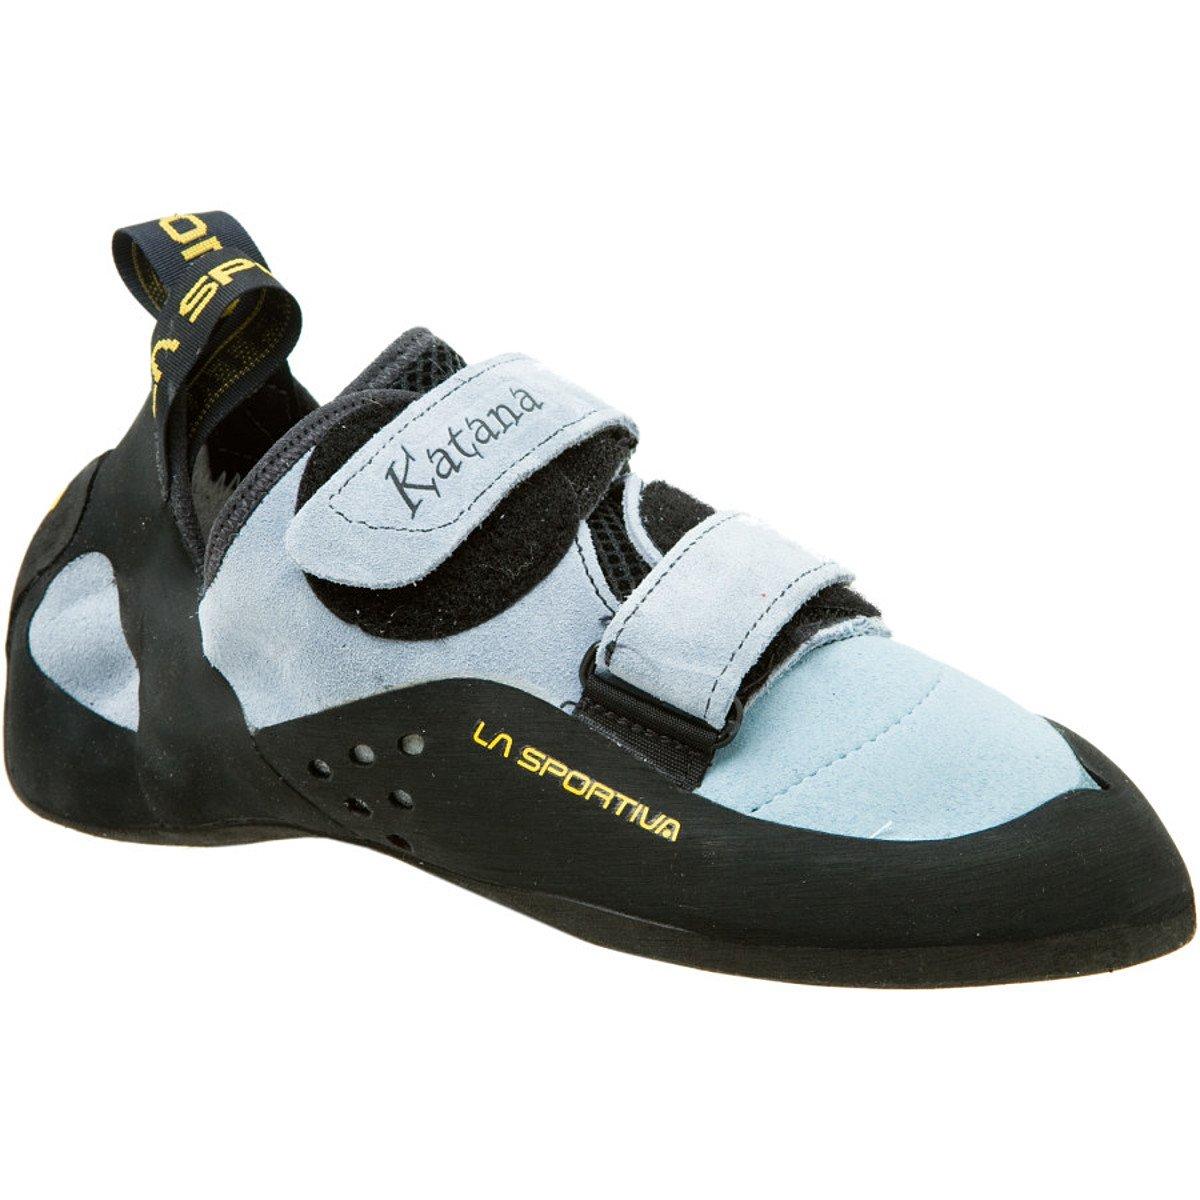 La Sportiva Katana Climbing Shoe - Women's 295-BLUE-40.5